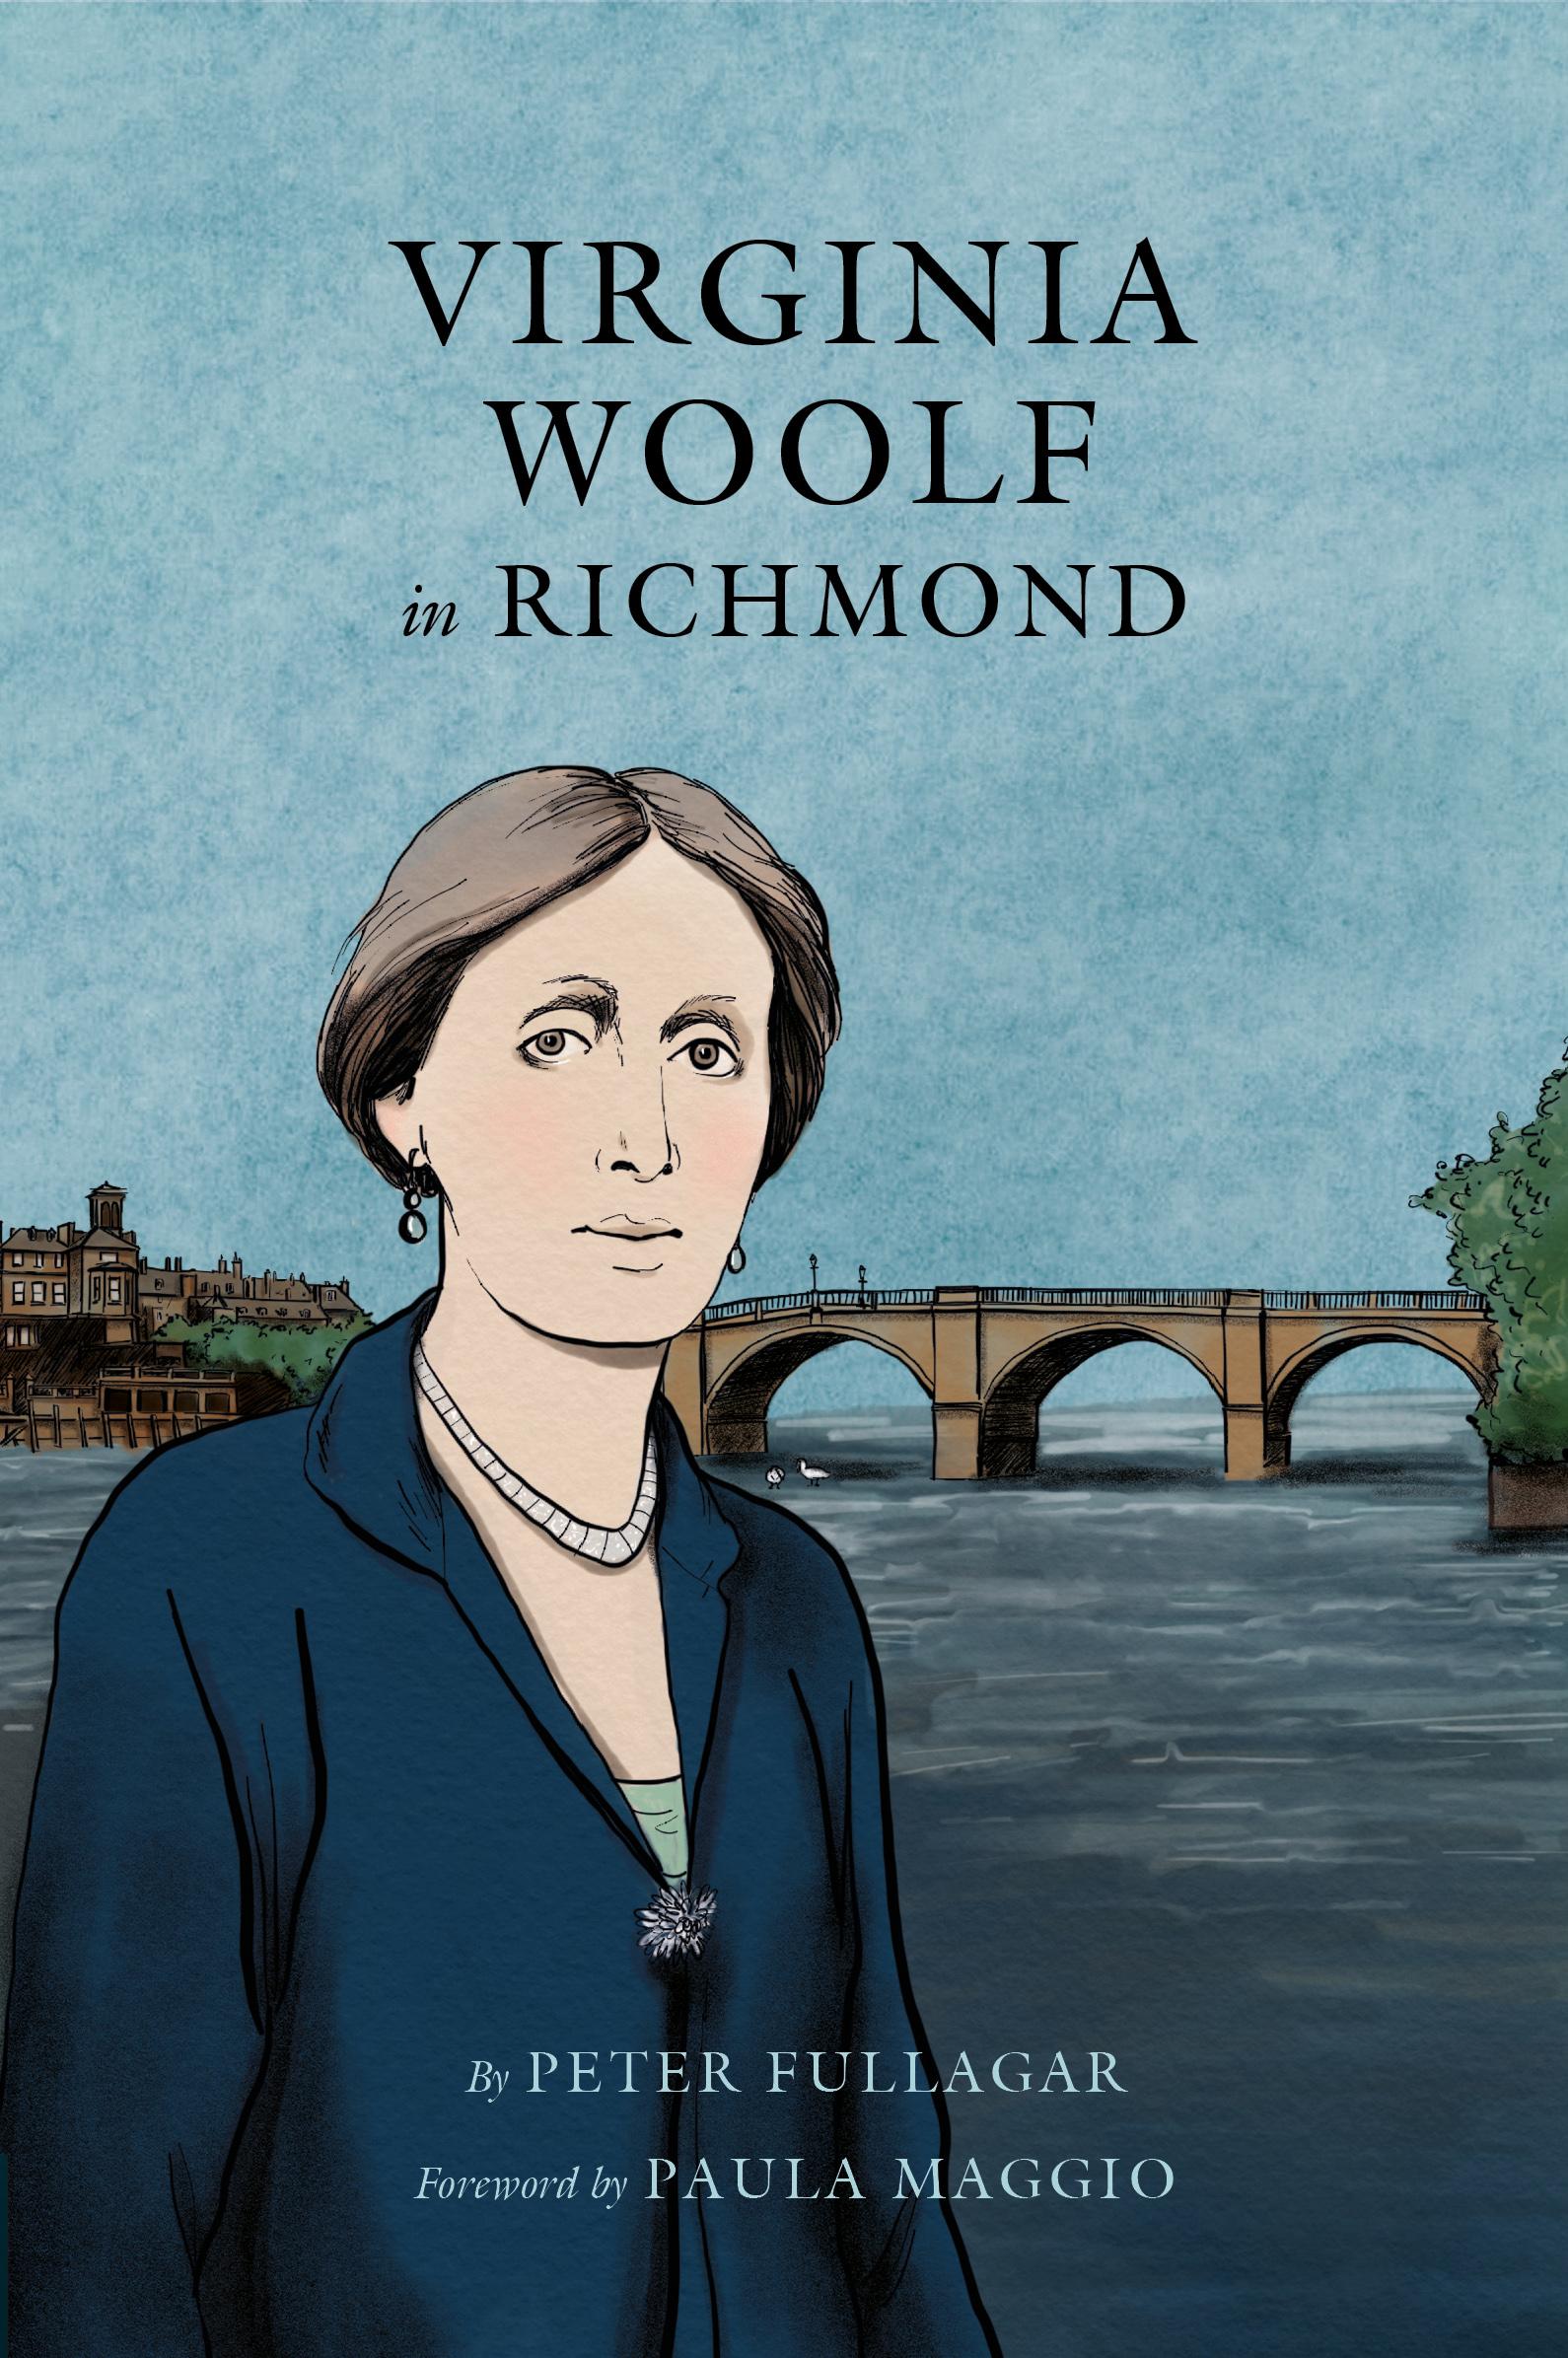 Virginia Woolf in Richmond talk at The Kew Society -Postponed